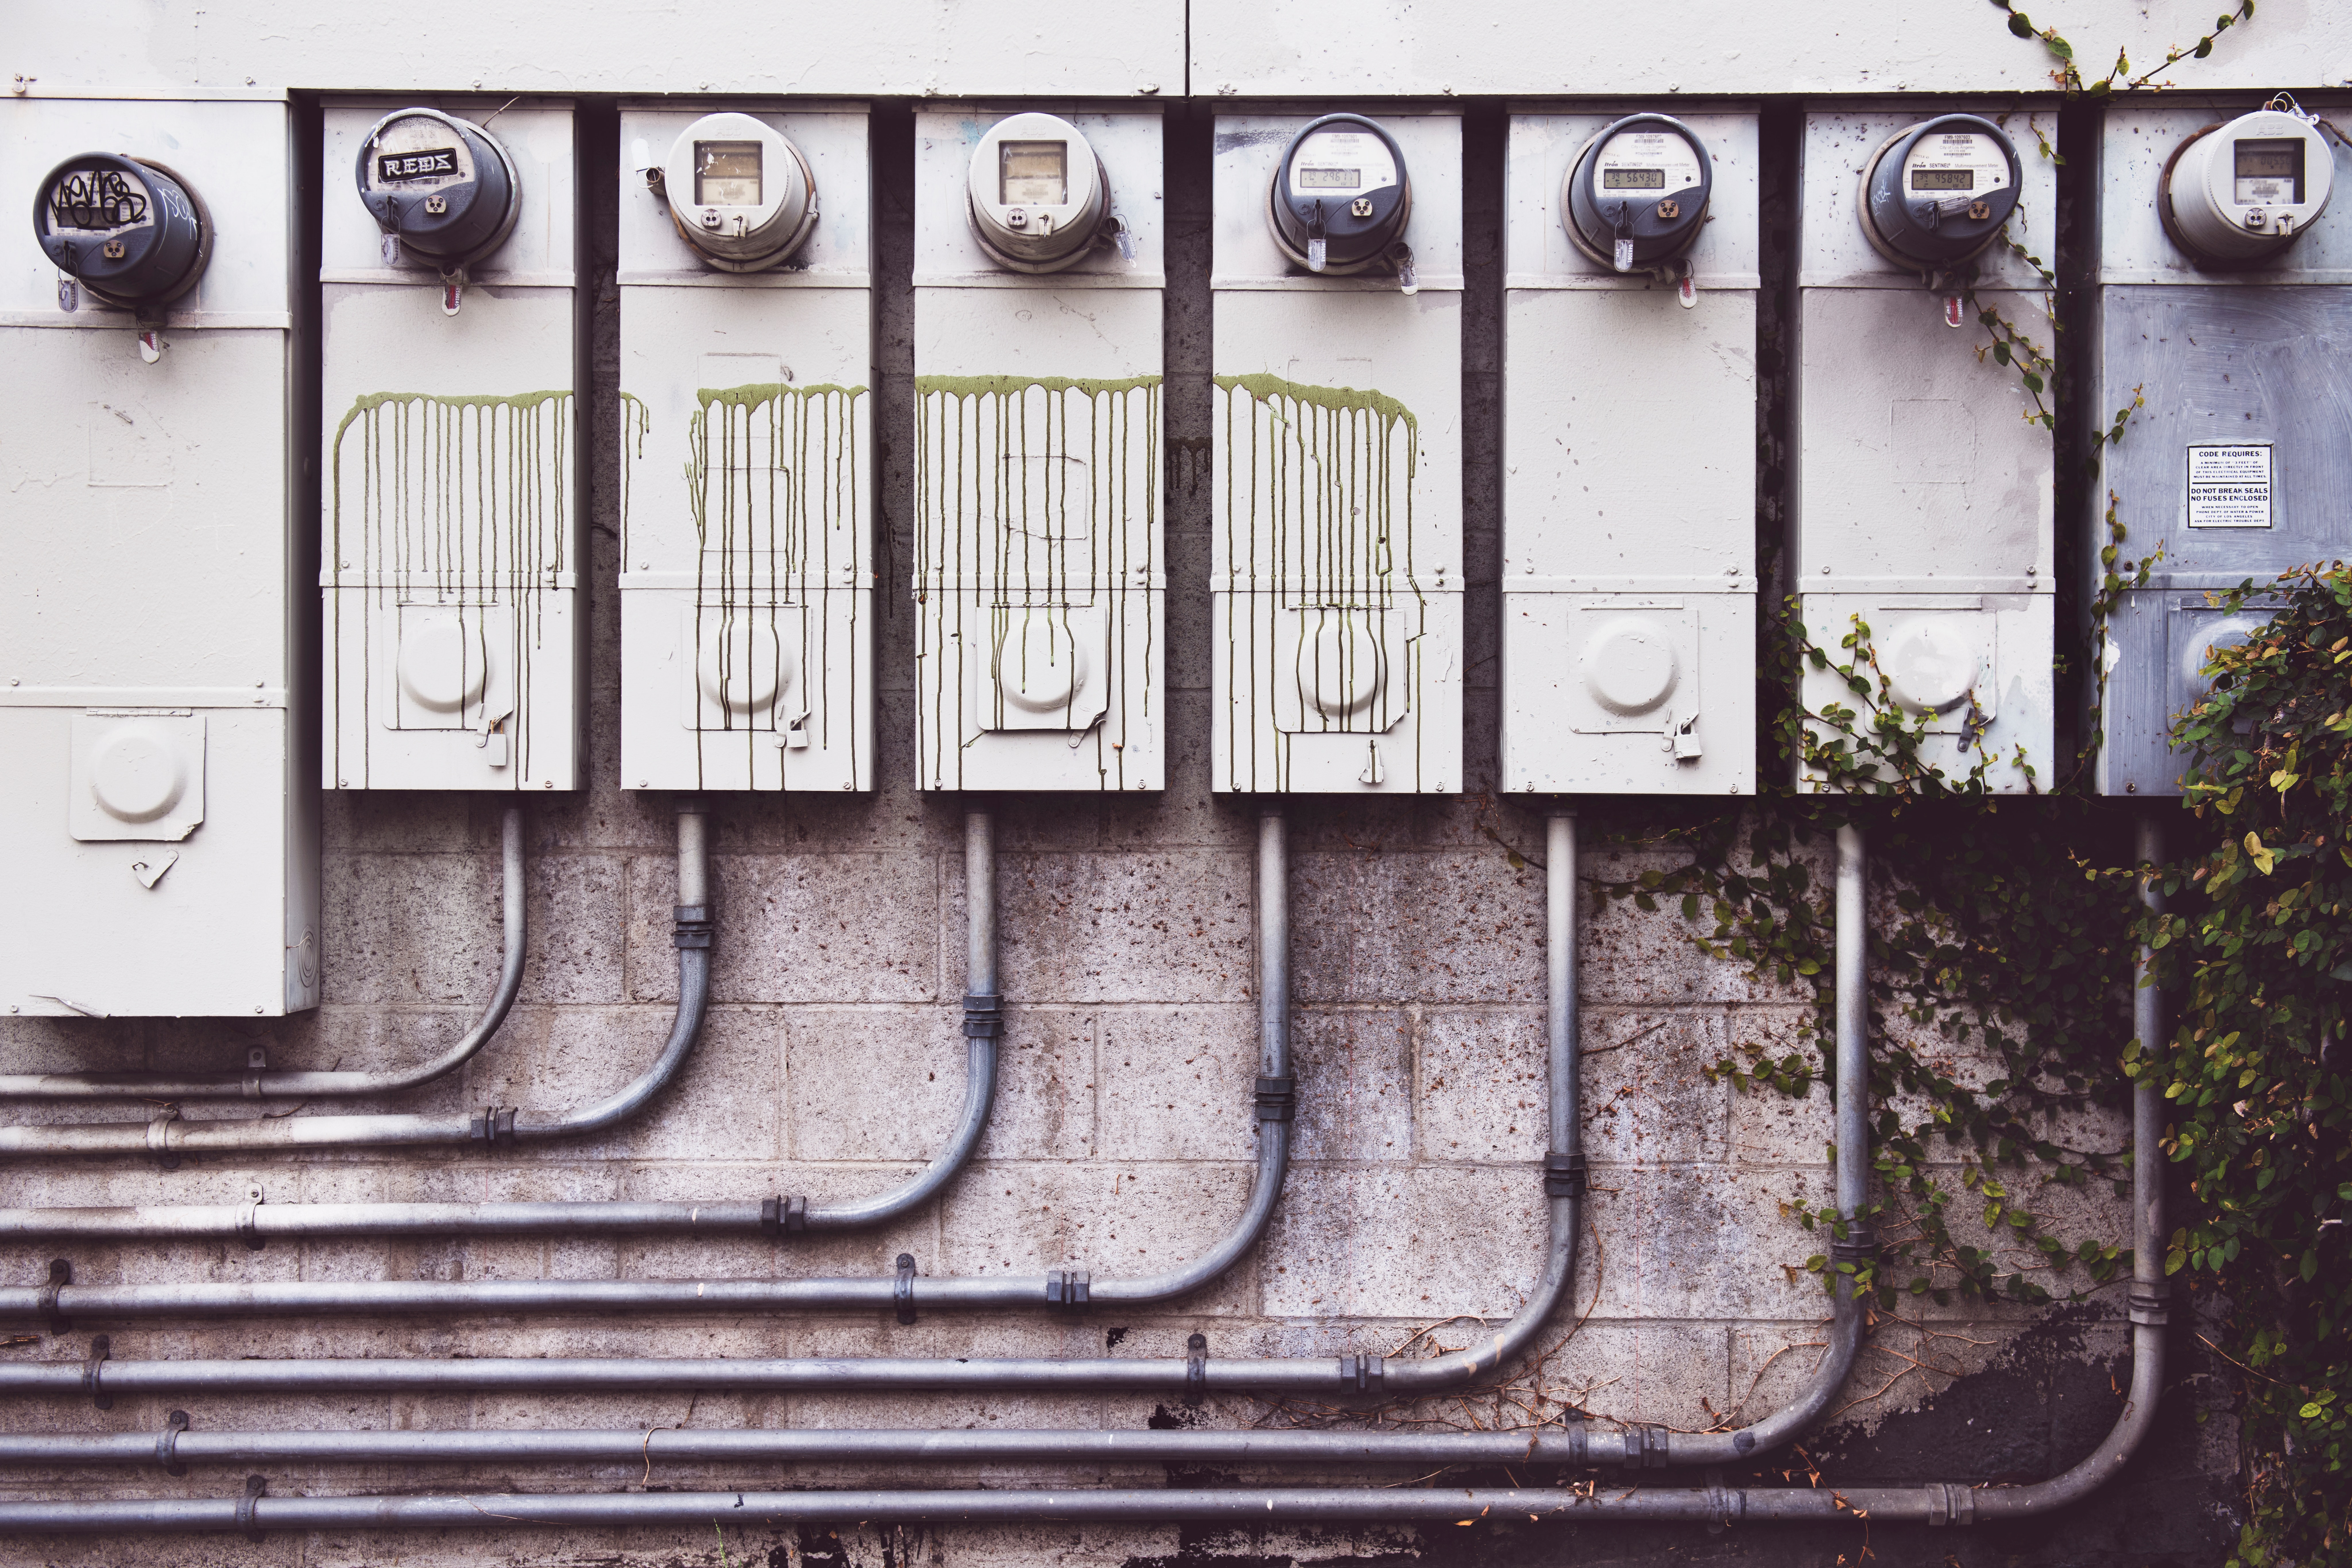 Eight electrical metric meters photo